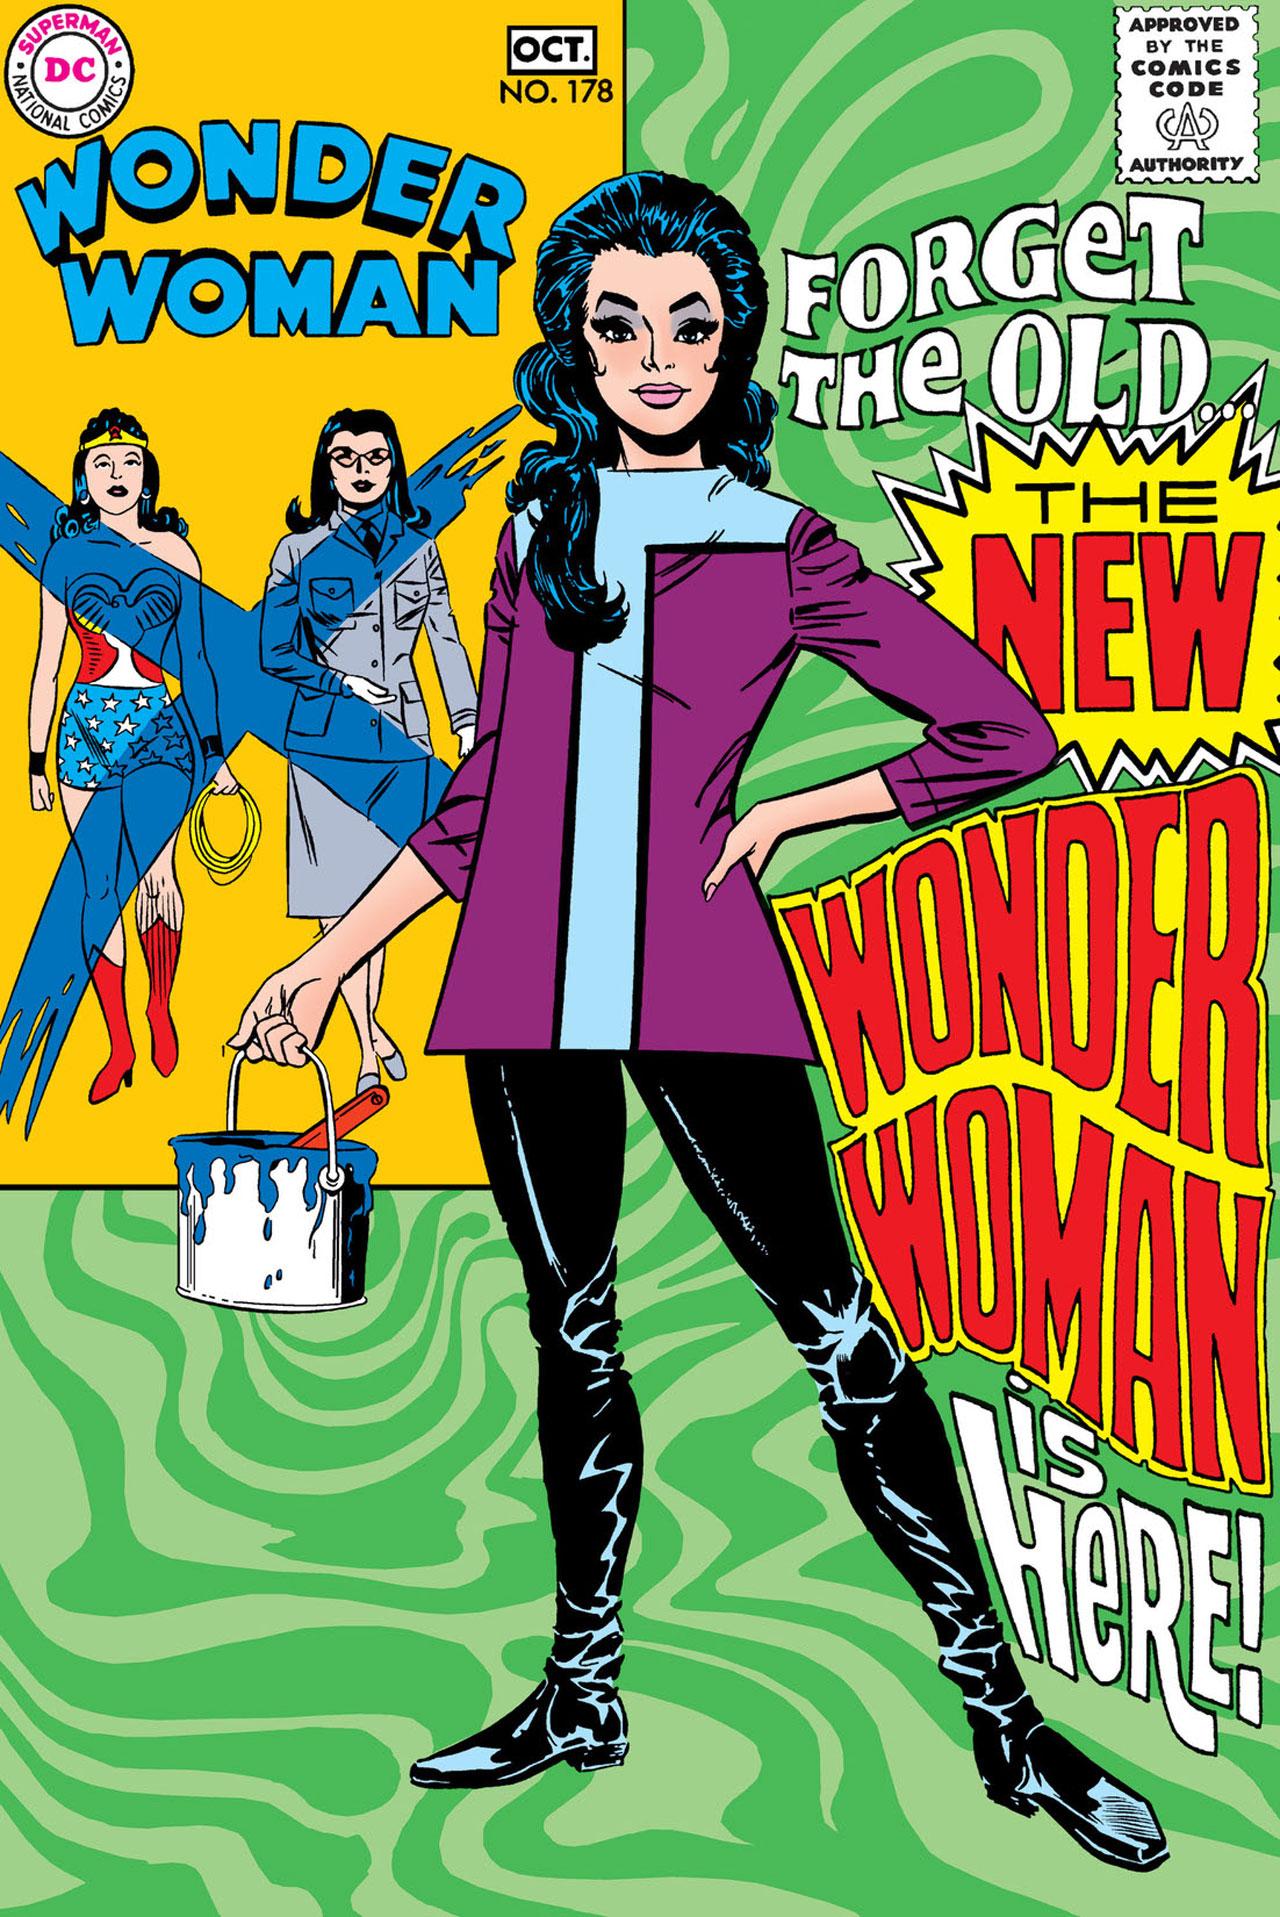 Wonder-Woman-cover.jpg